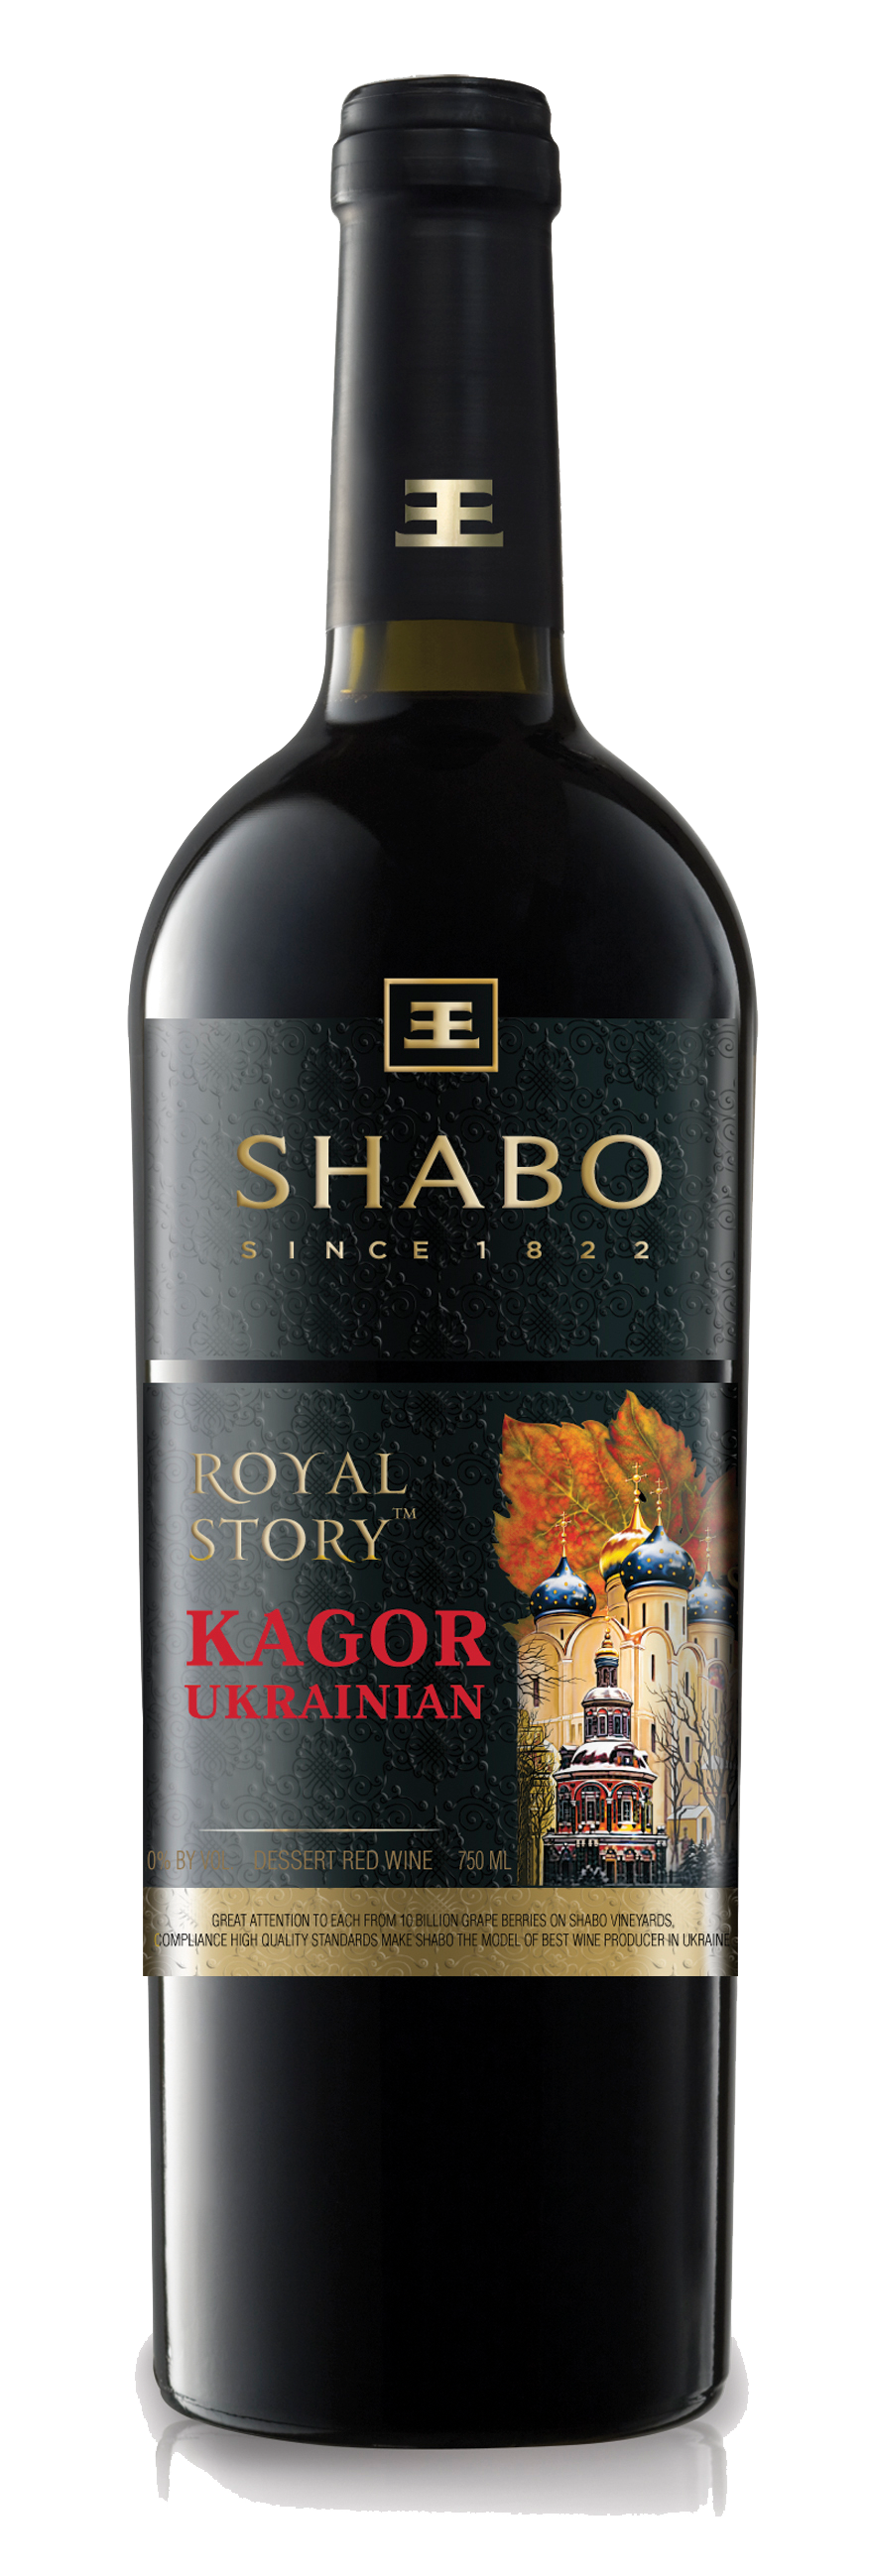 KAGOR UKRAINE SHABO